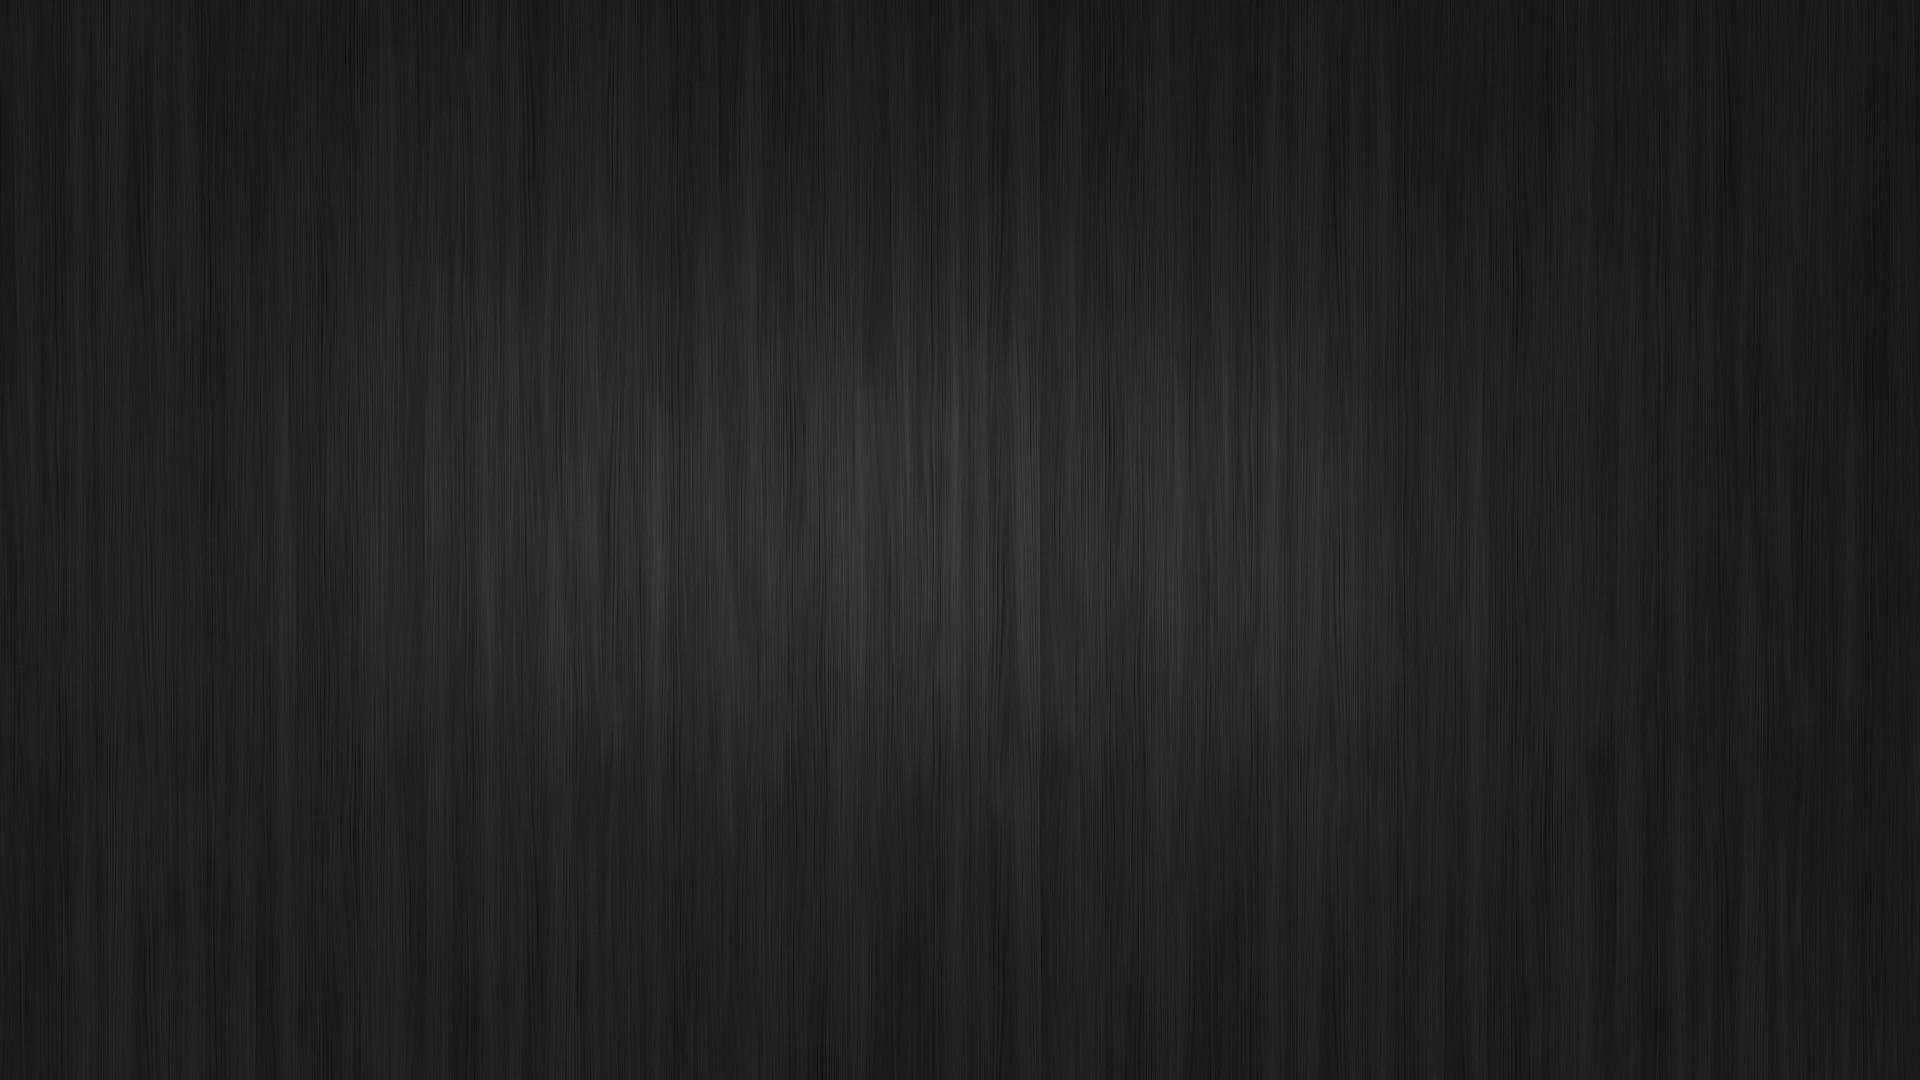 1600x2560 Car Wallpaper 1080p Vertical Wallpaper 83 Images